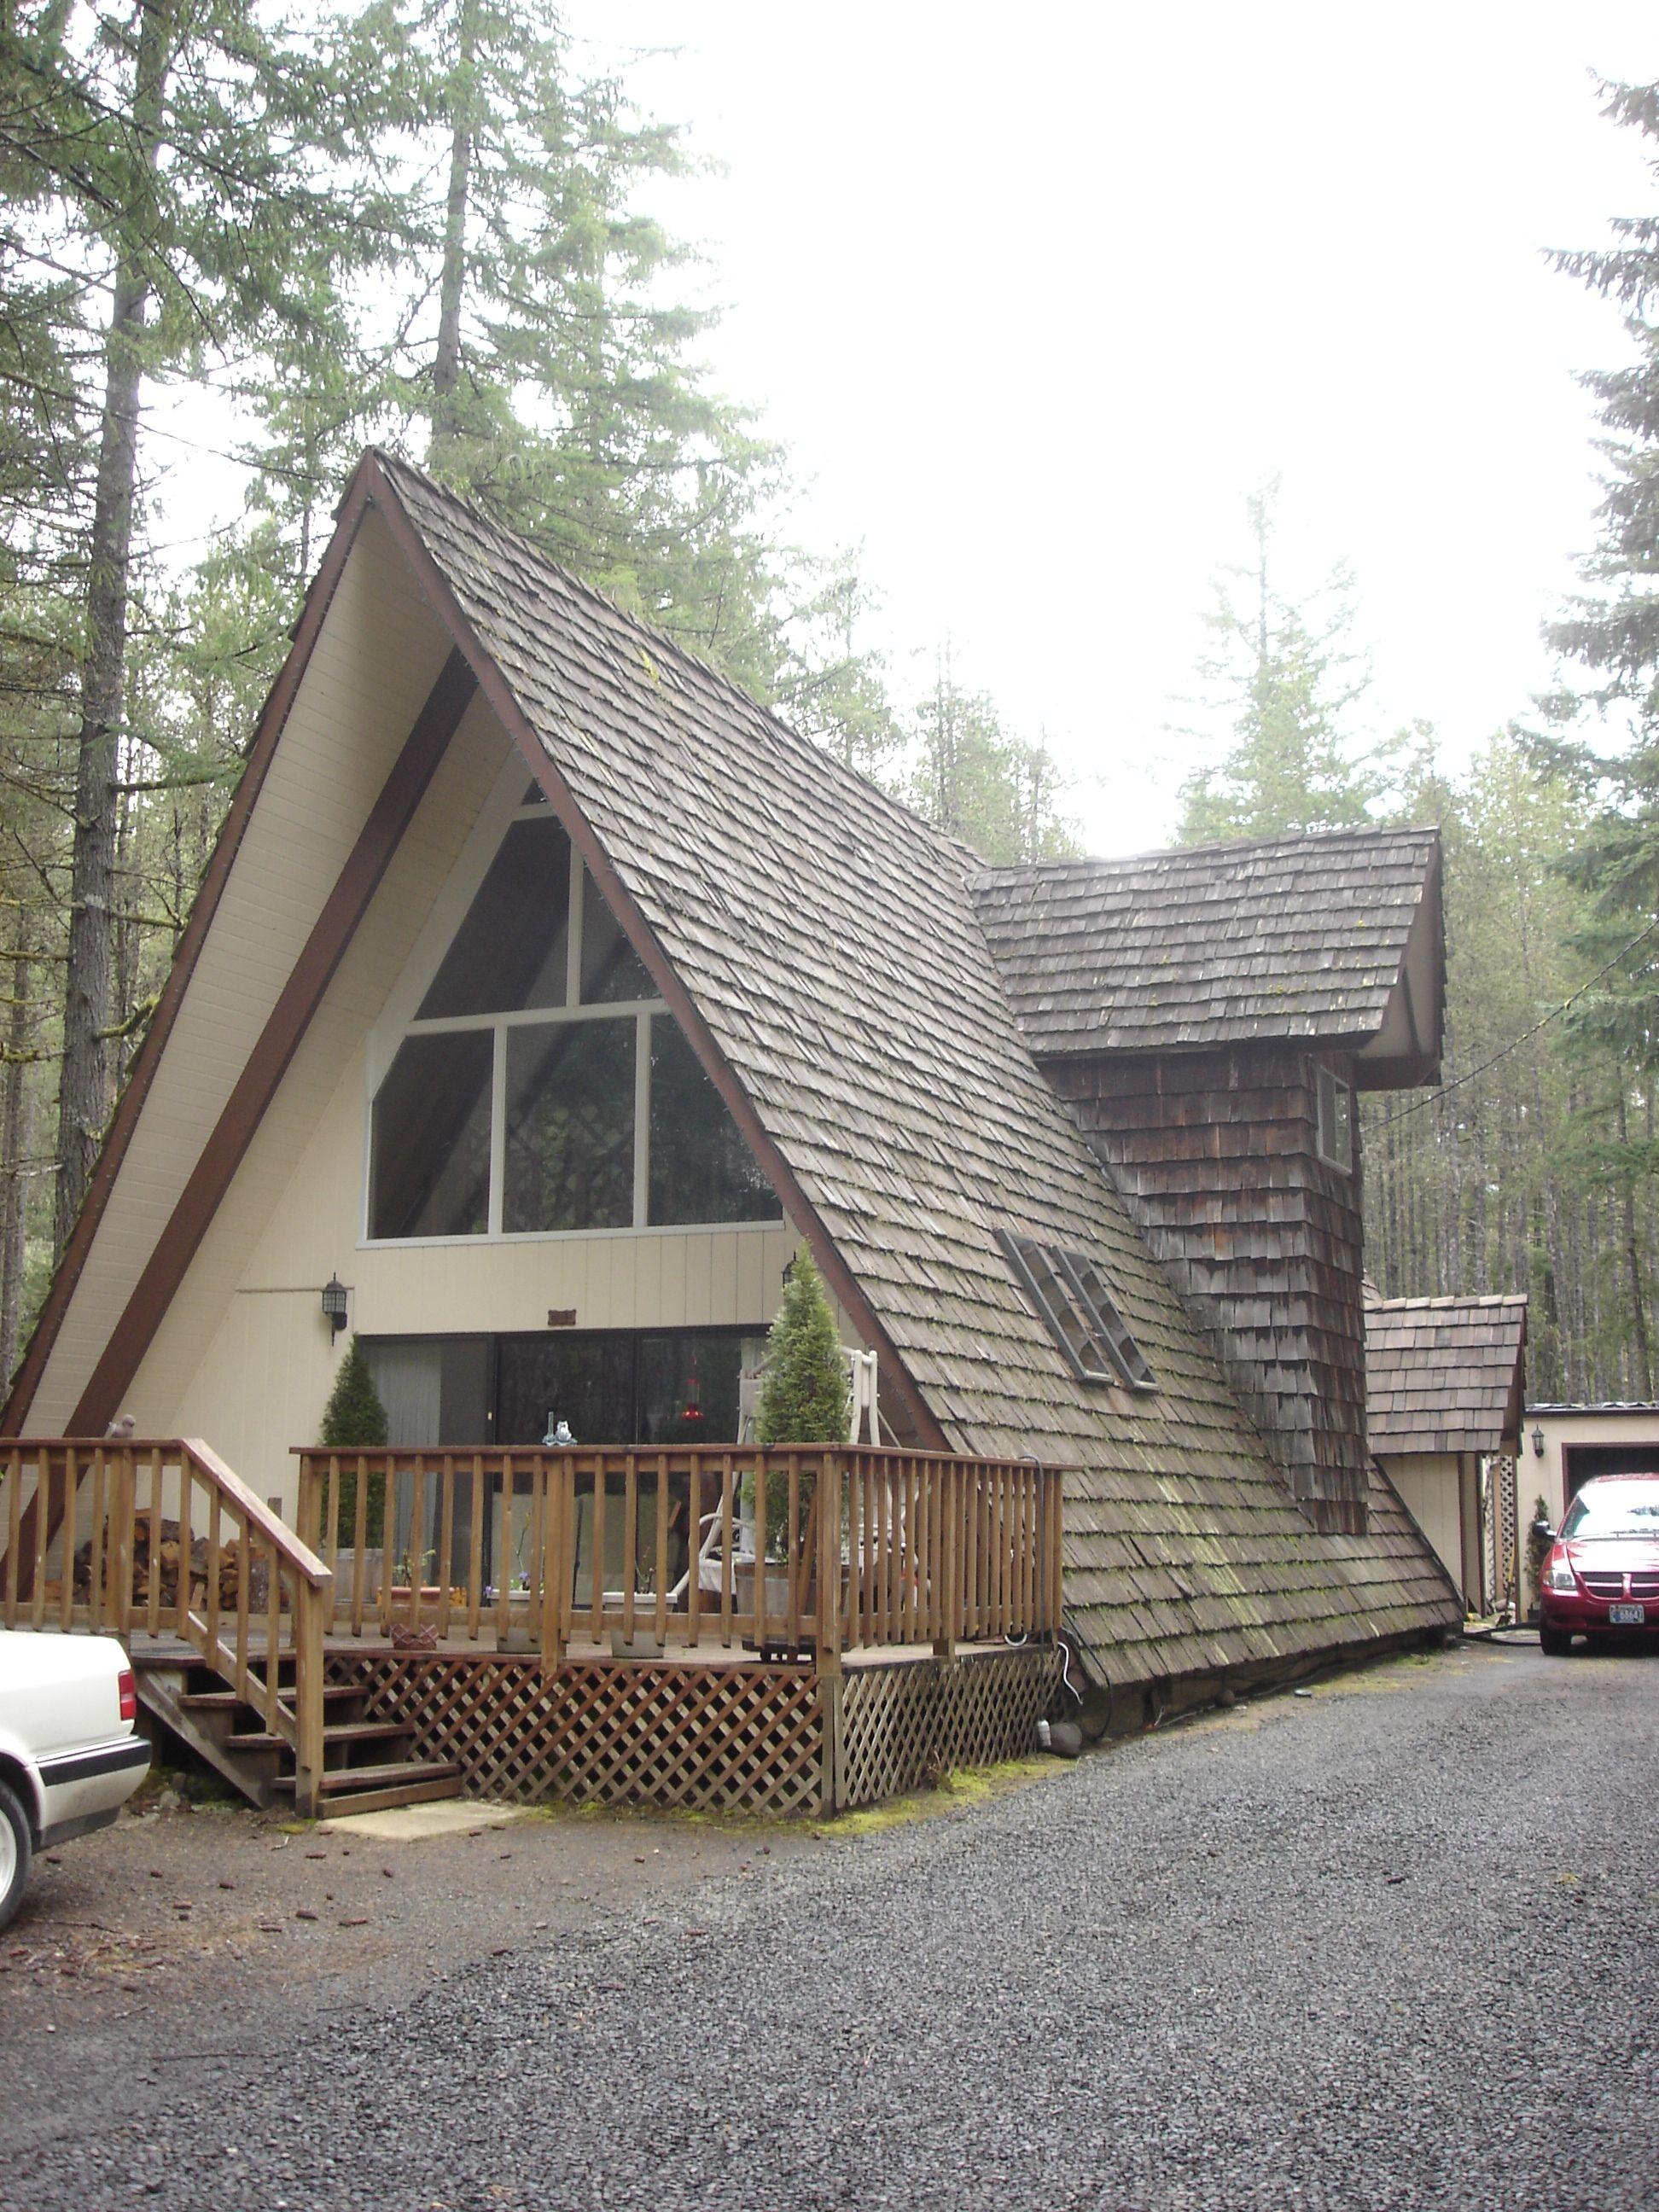 a frame houses | House Frame. The shingles are cute, but I would ...